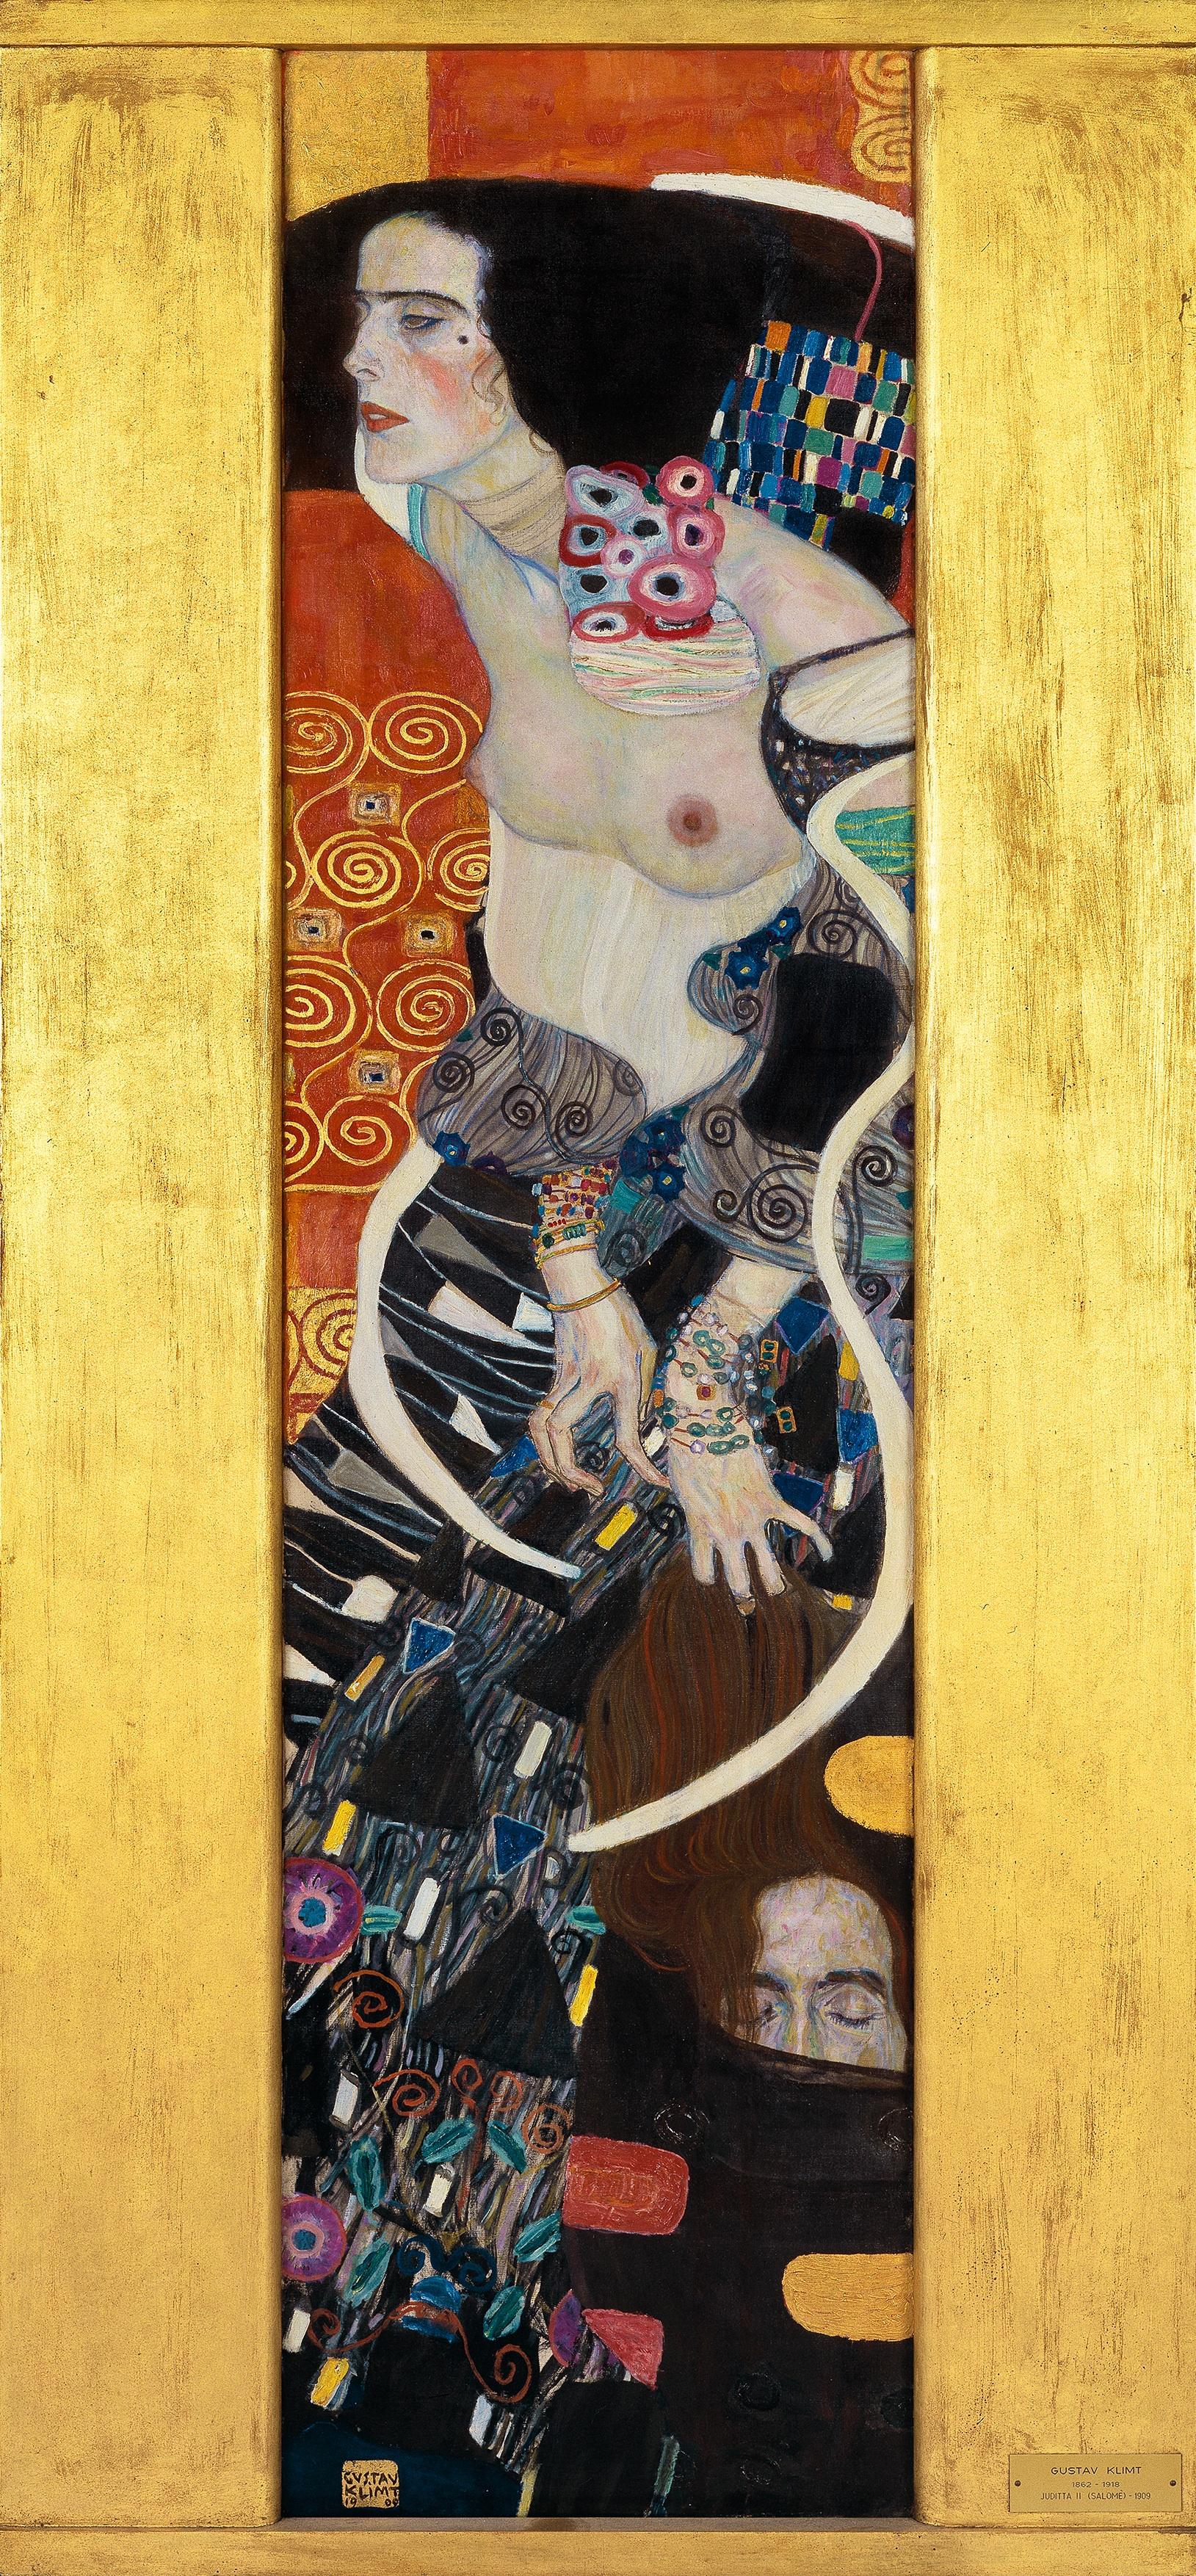 File:Gustav Klimt, Judith II.jpg - Wikimedia Commons